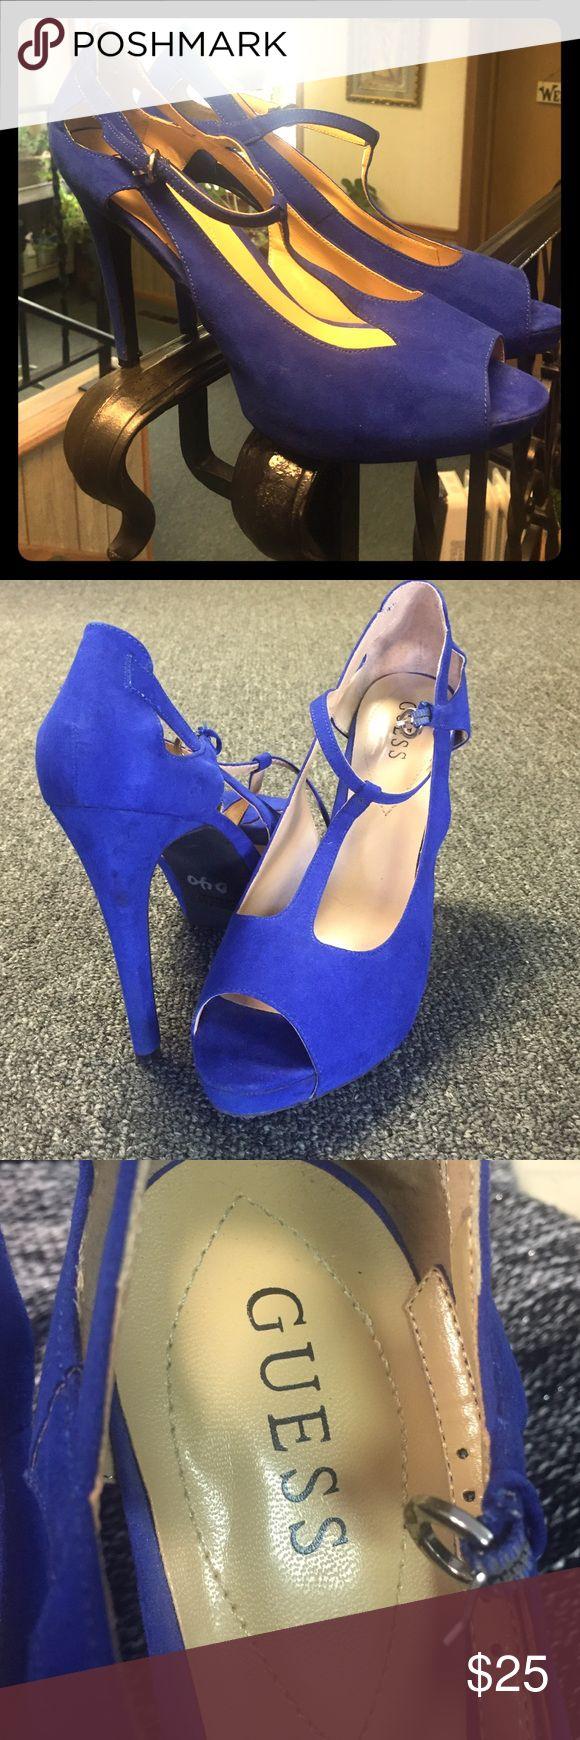 Guess Royal Blue Suede peep toe pumps. Guess Royal Blue Suede peep toe pumps. Size 10M. Worn once. Guess Shoes Heels